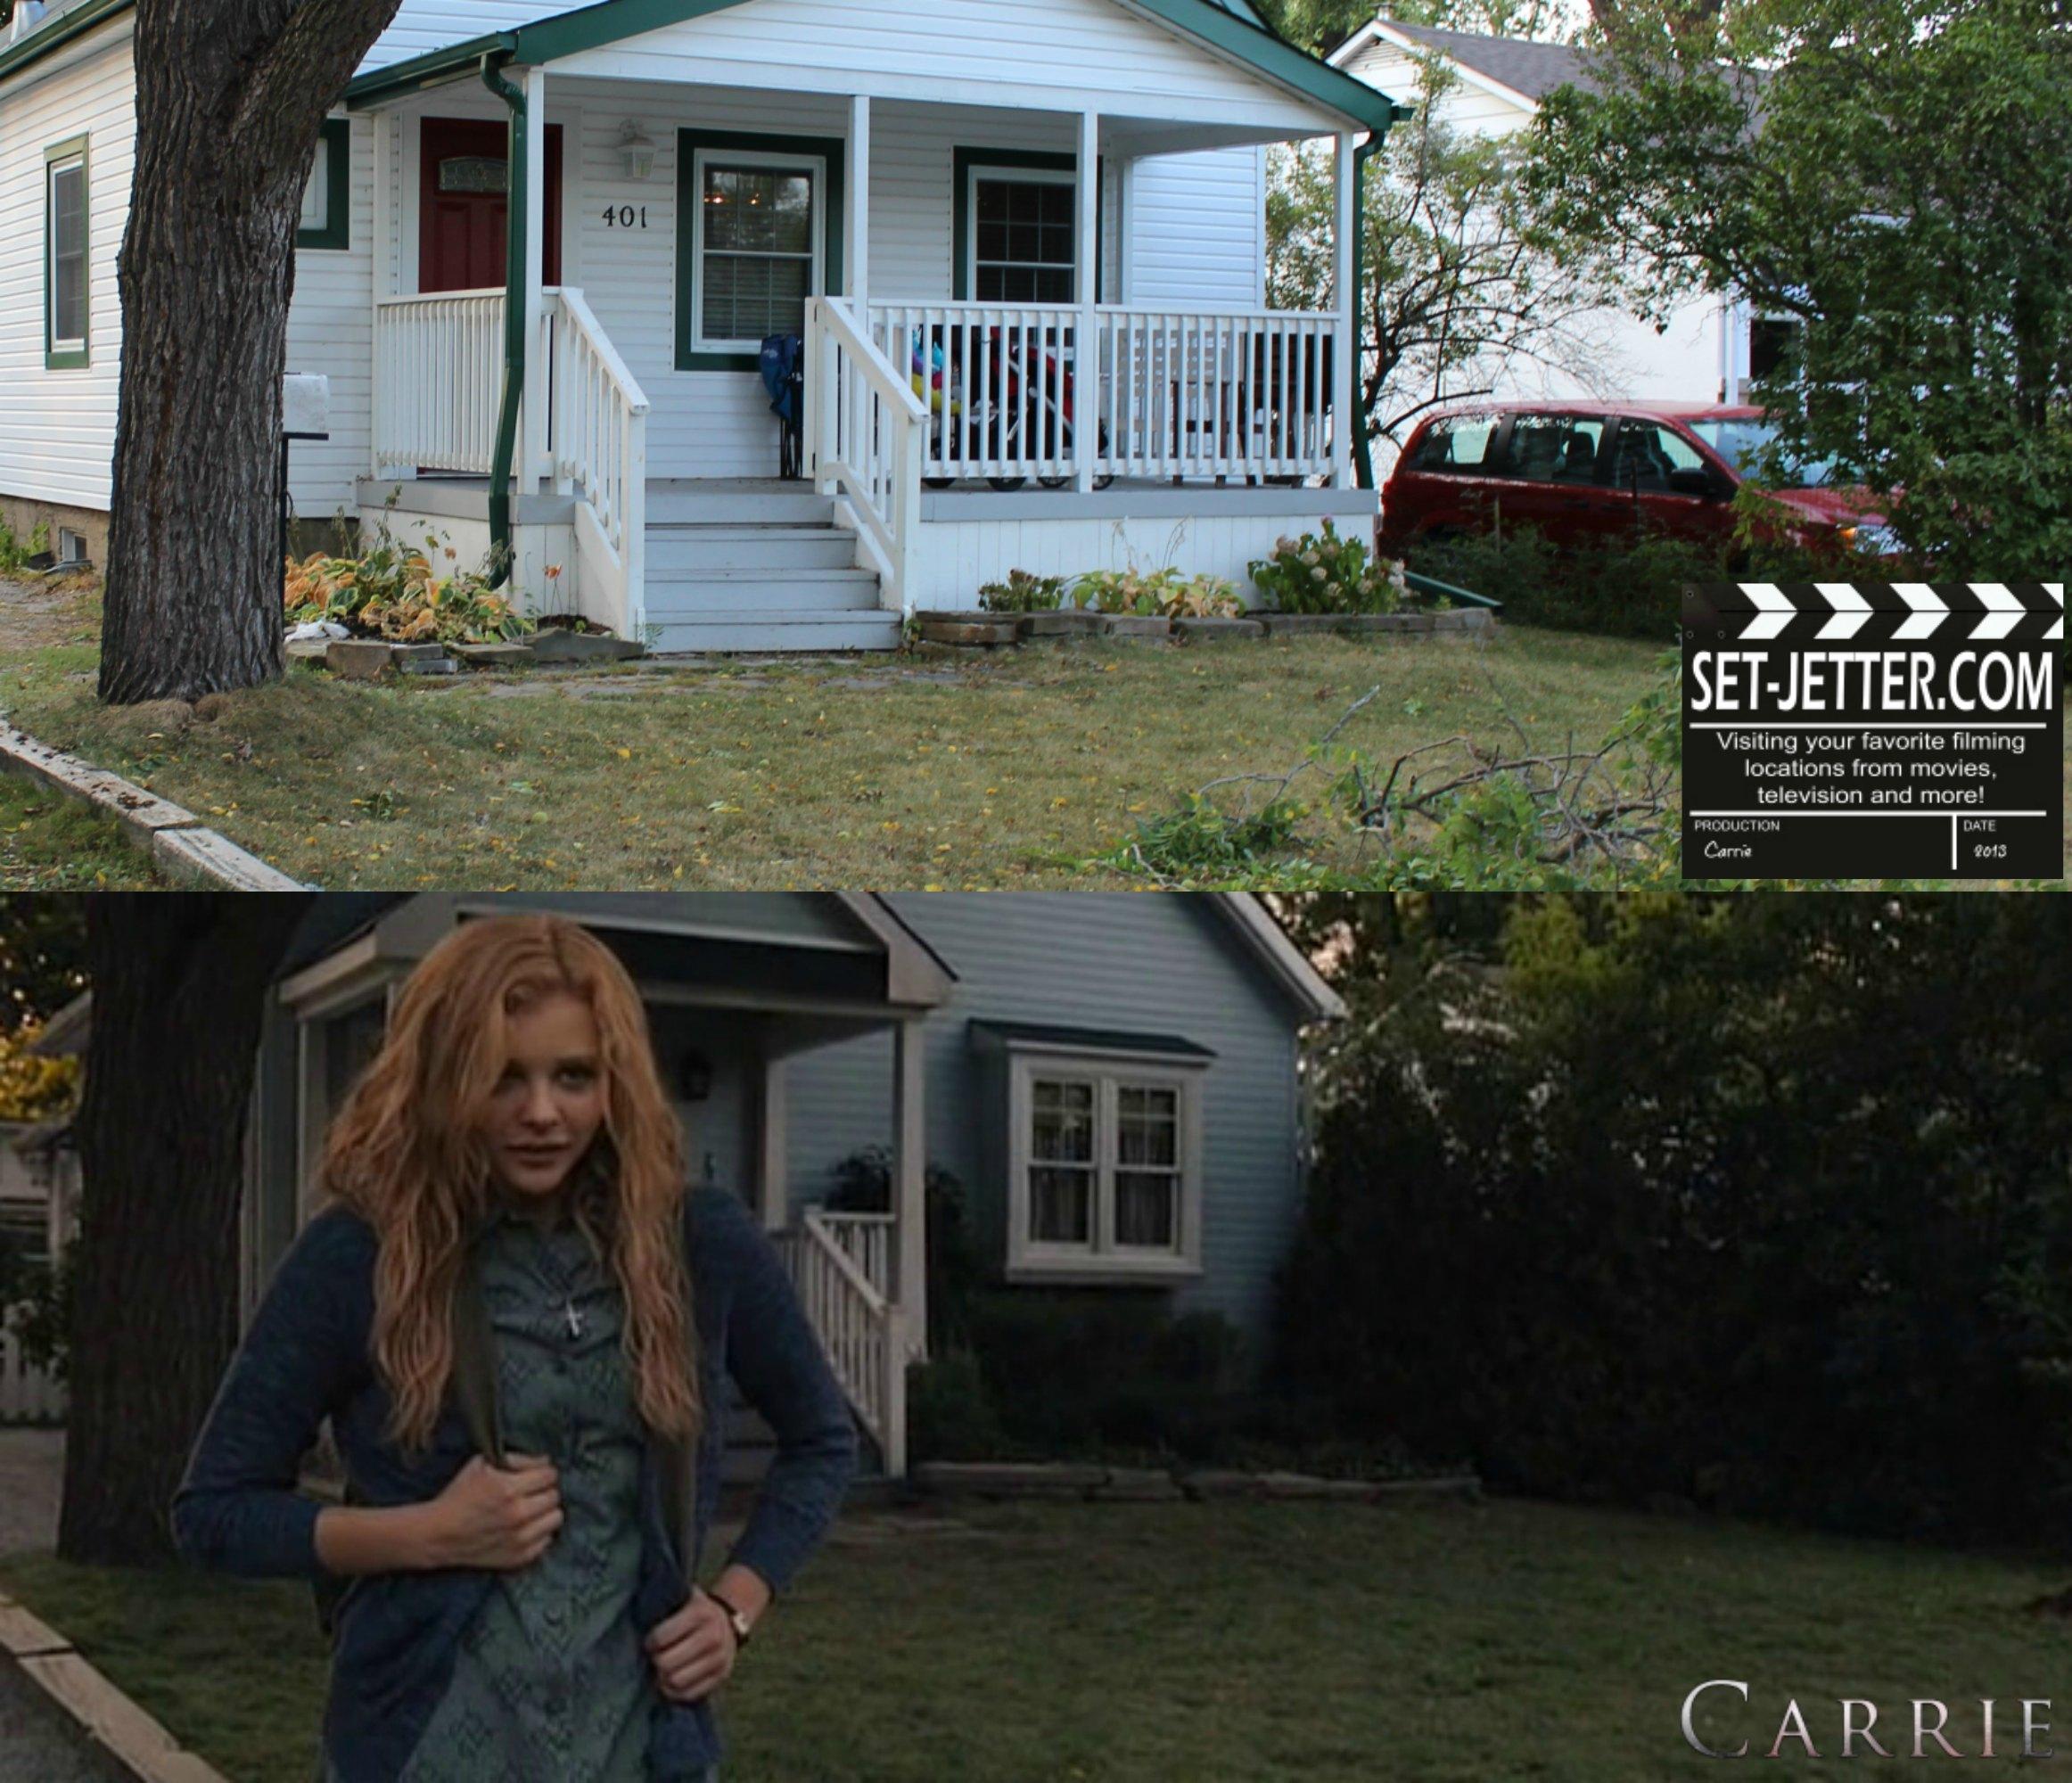 Carrie 2013 comparison 26.jpg